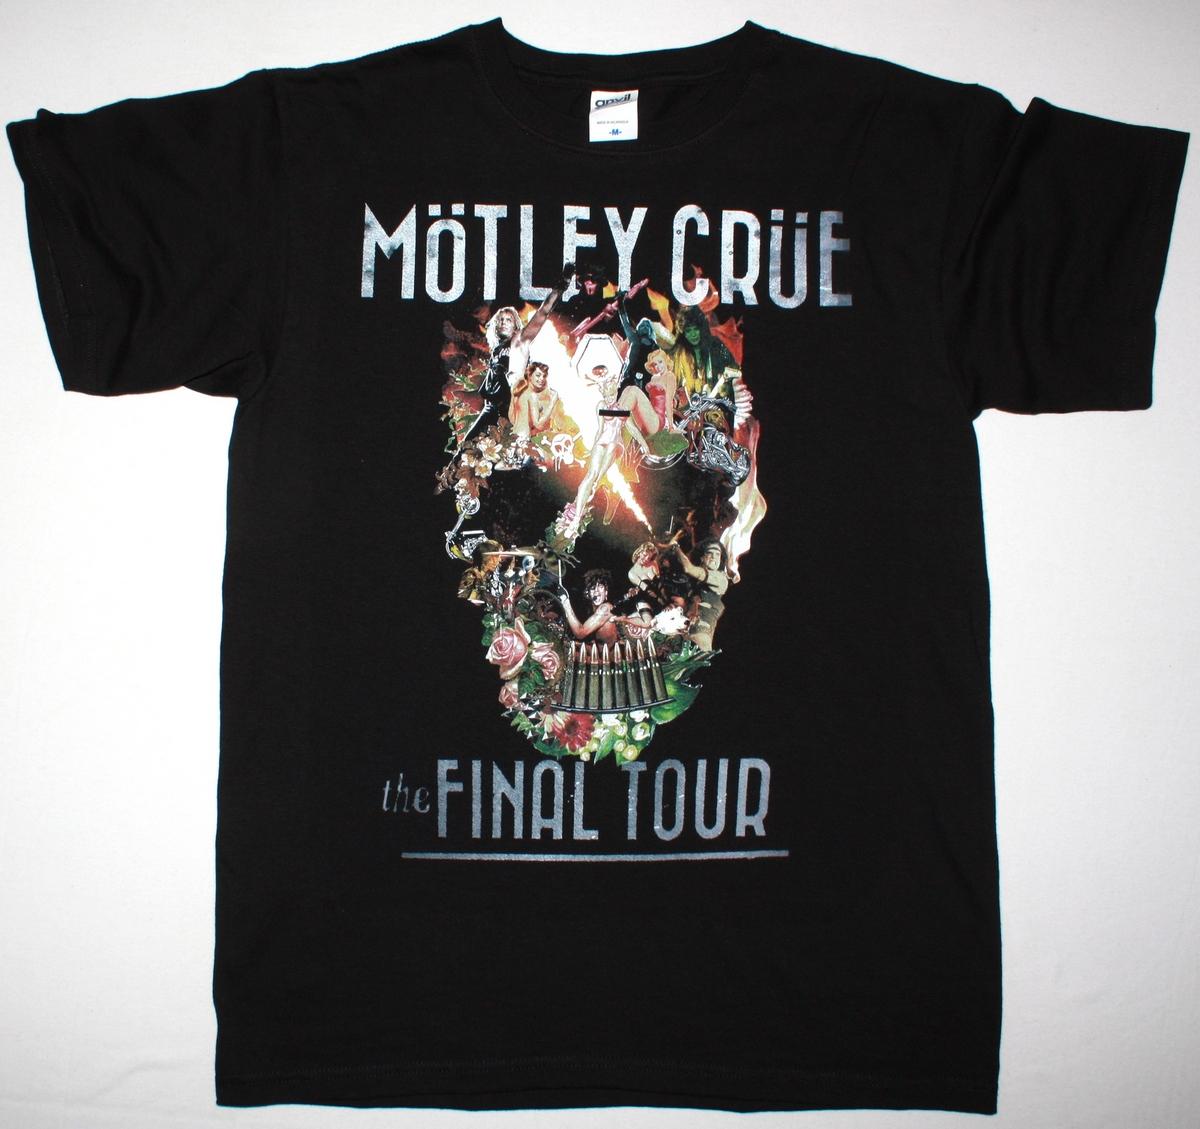 MOTLEY CRUE THE FINAL TOUR 2015 NEW BLACK T-SHIRT